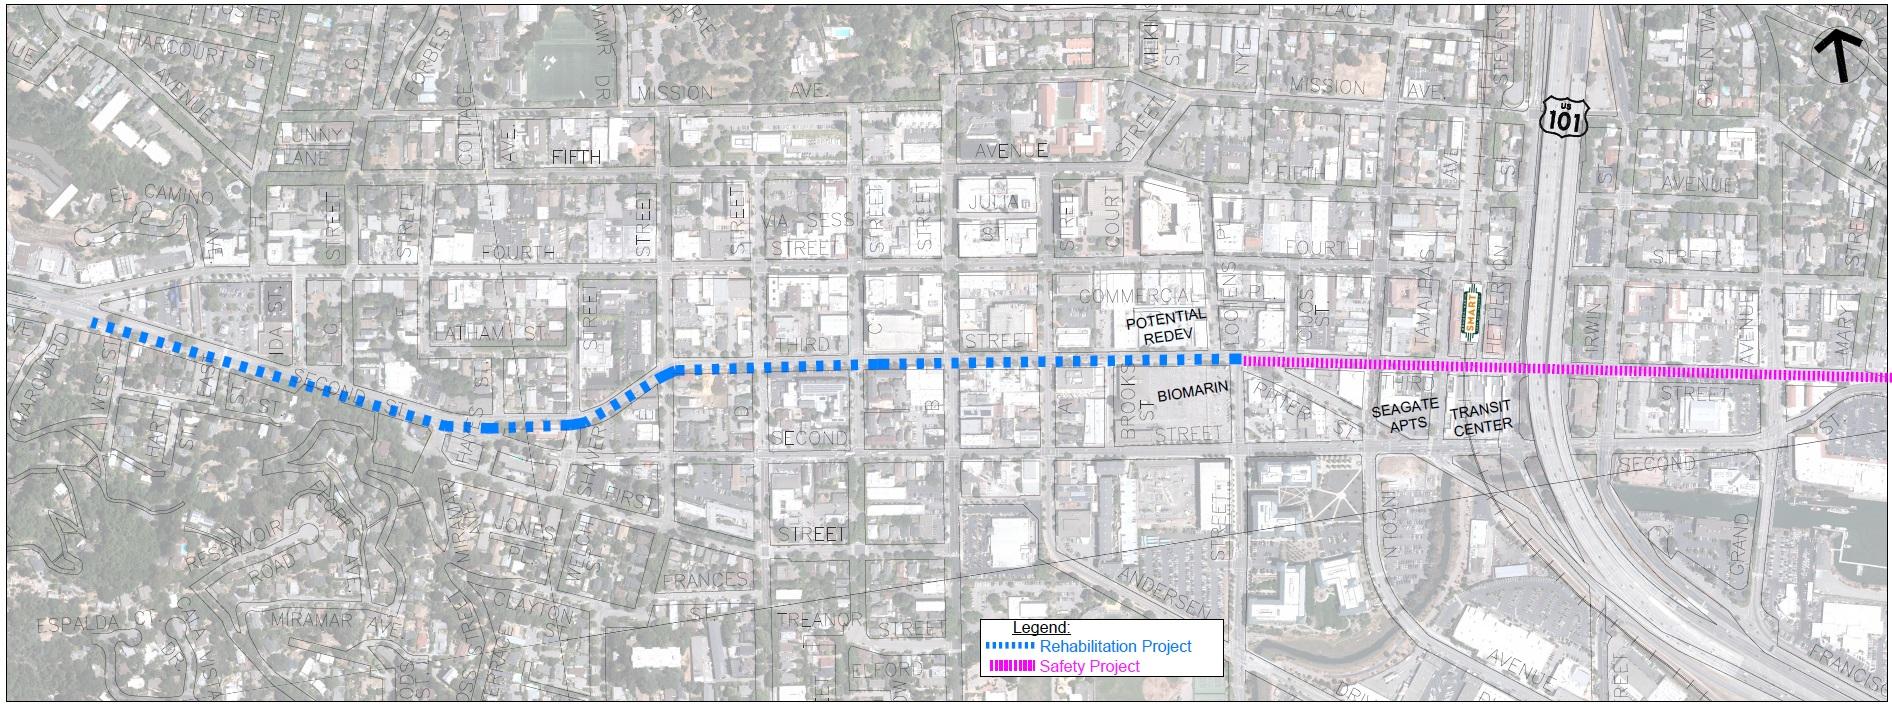 Third Street Project Limits